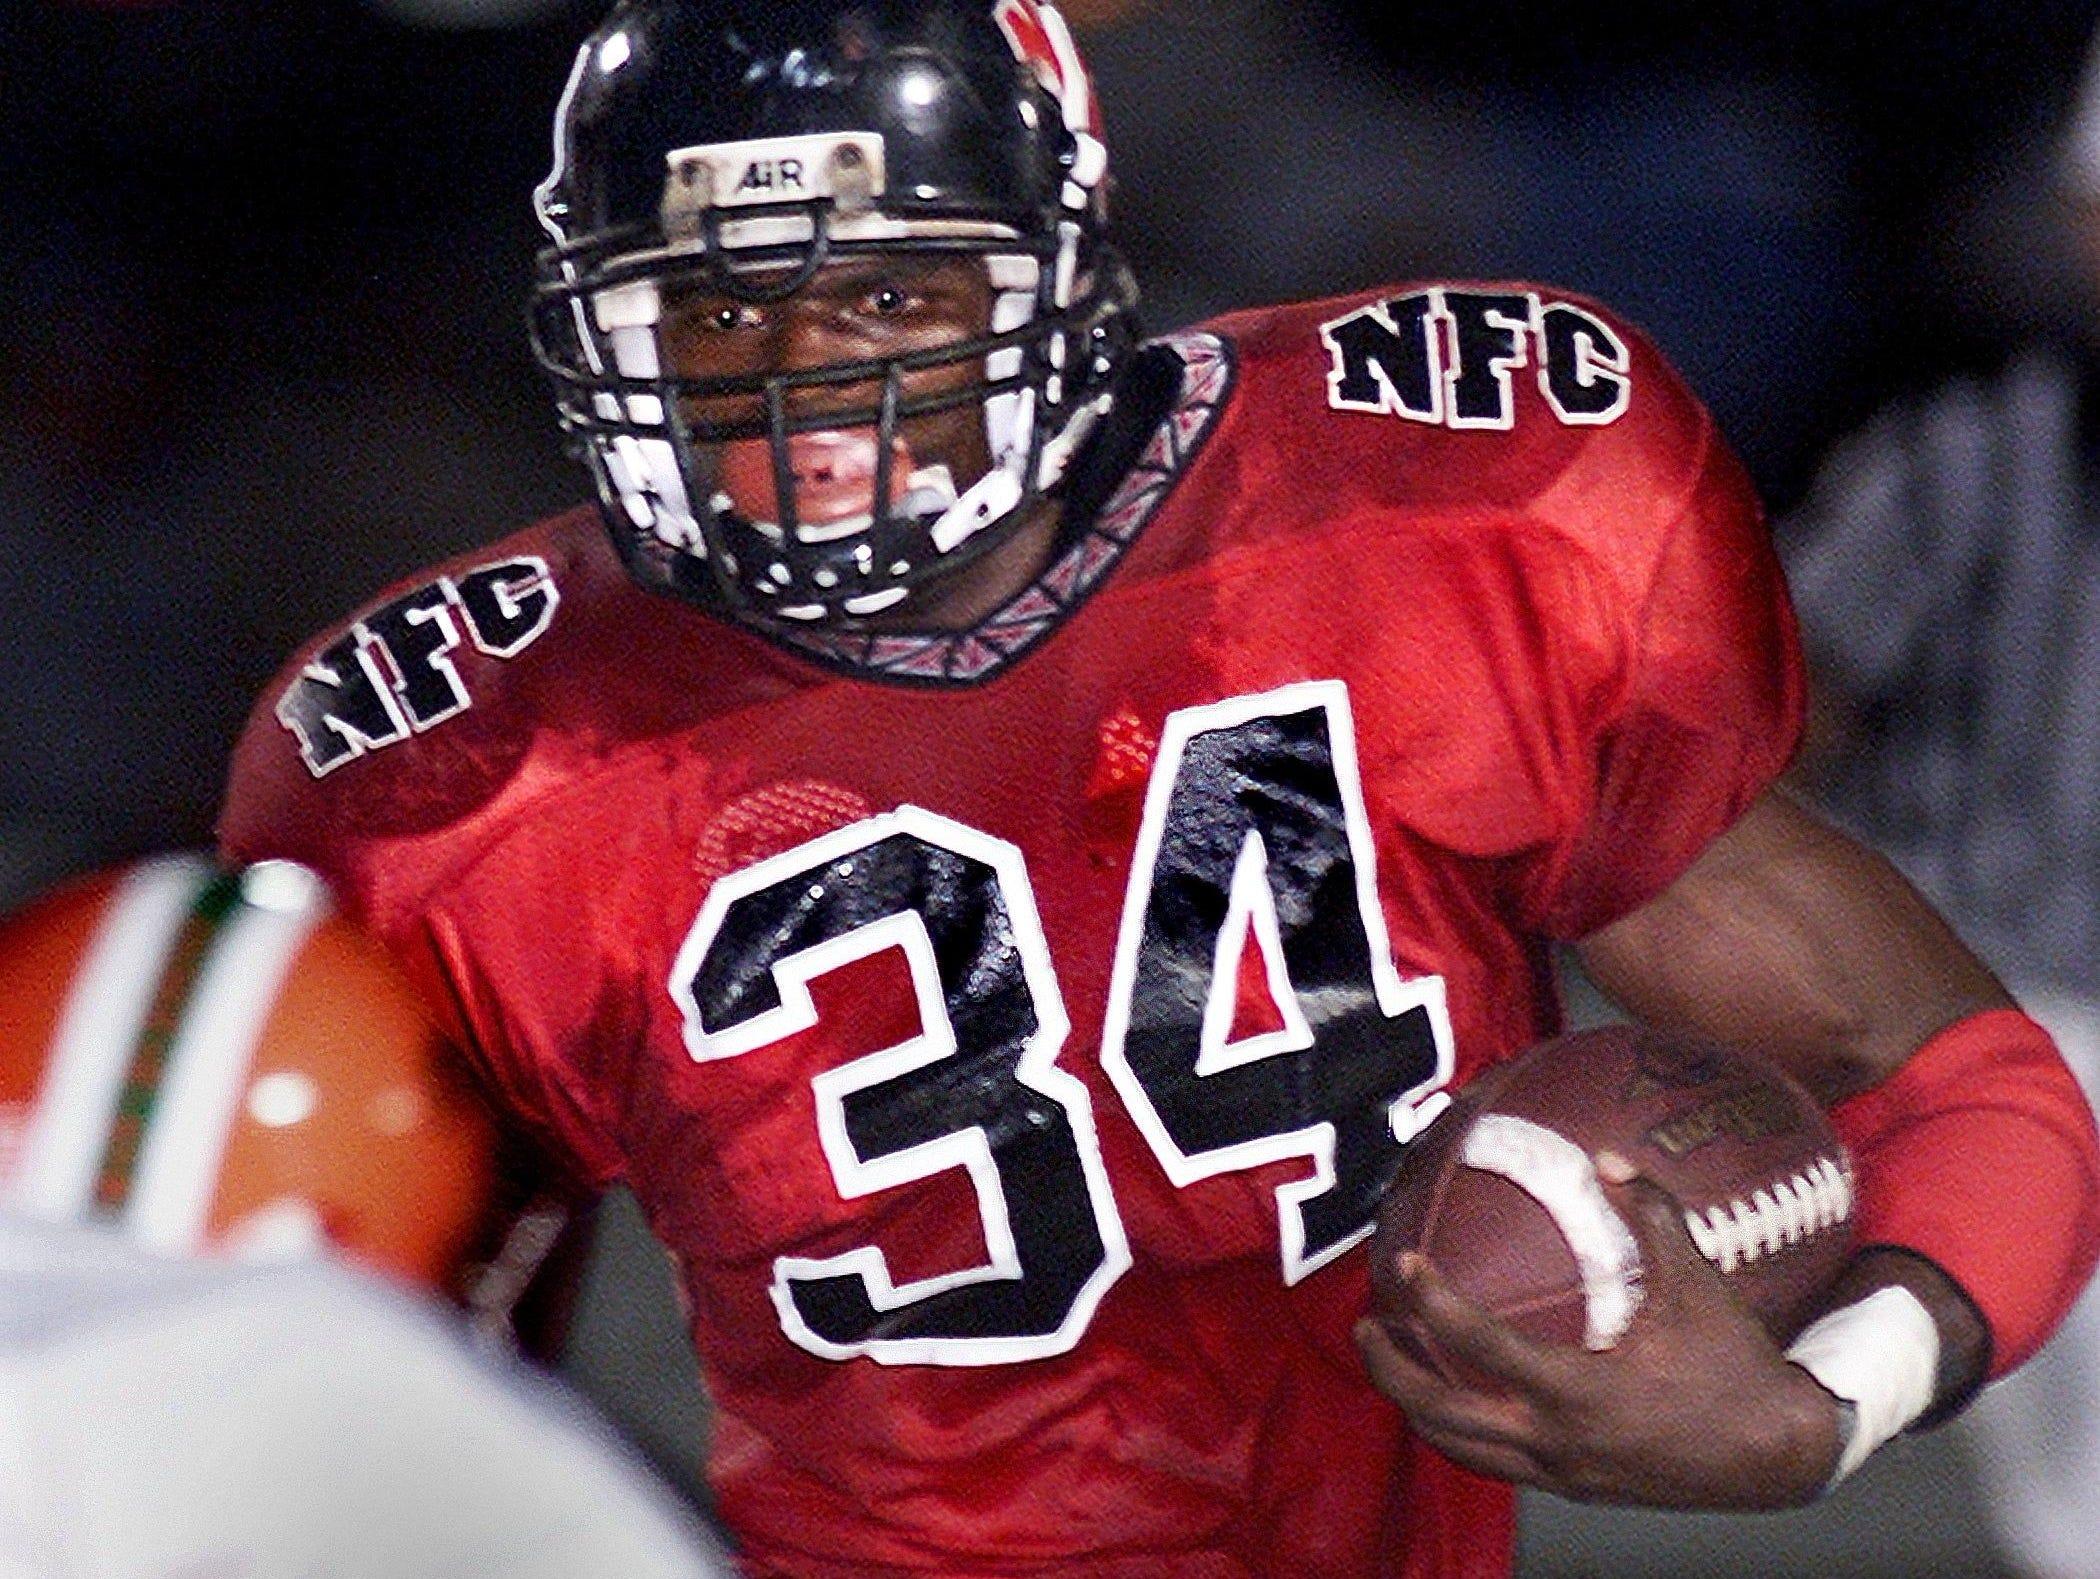 North Florida Christian's Ernie Sims runs against FAMU High on Oct. 12, 2001.